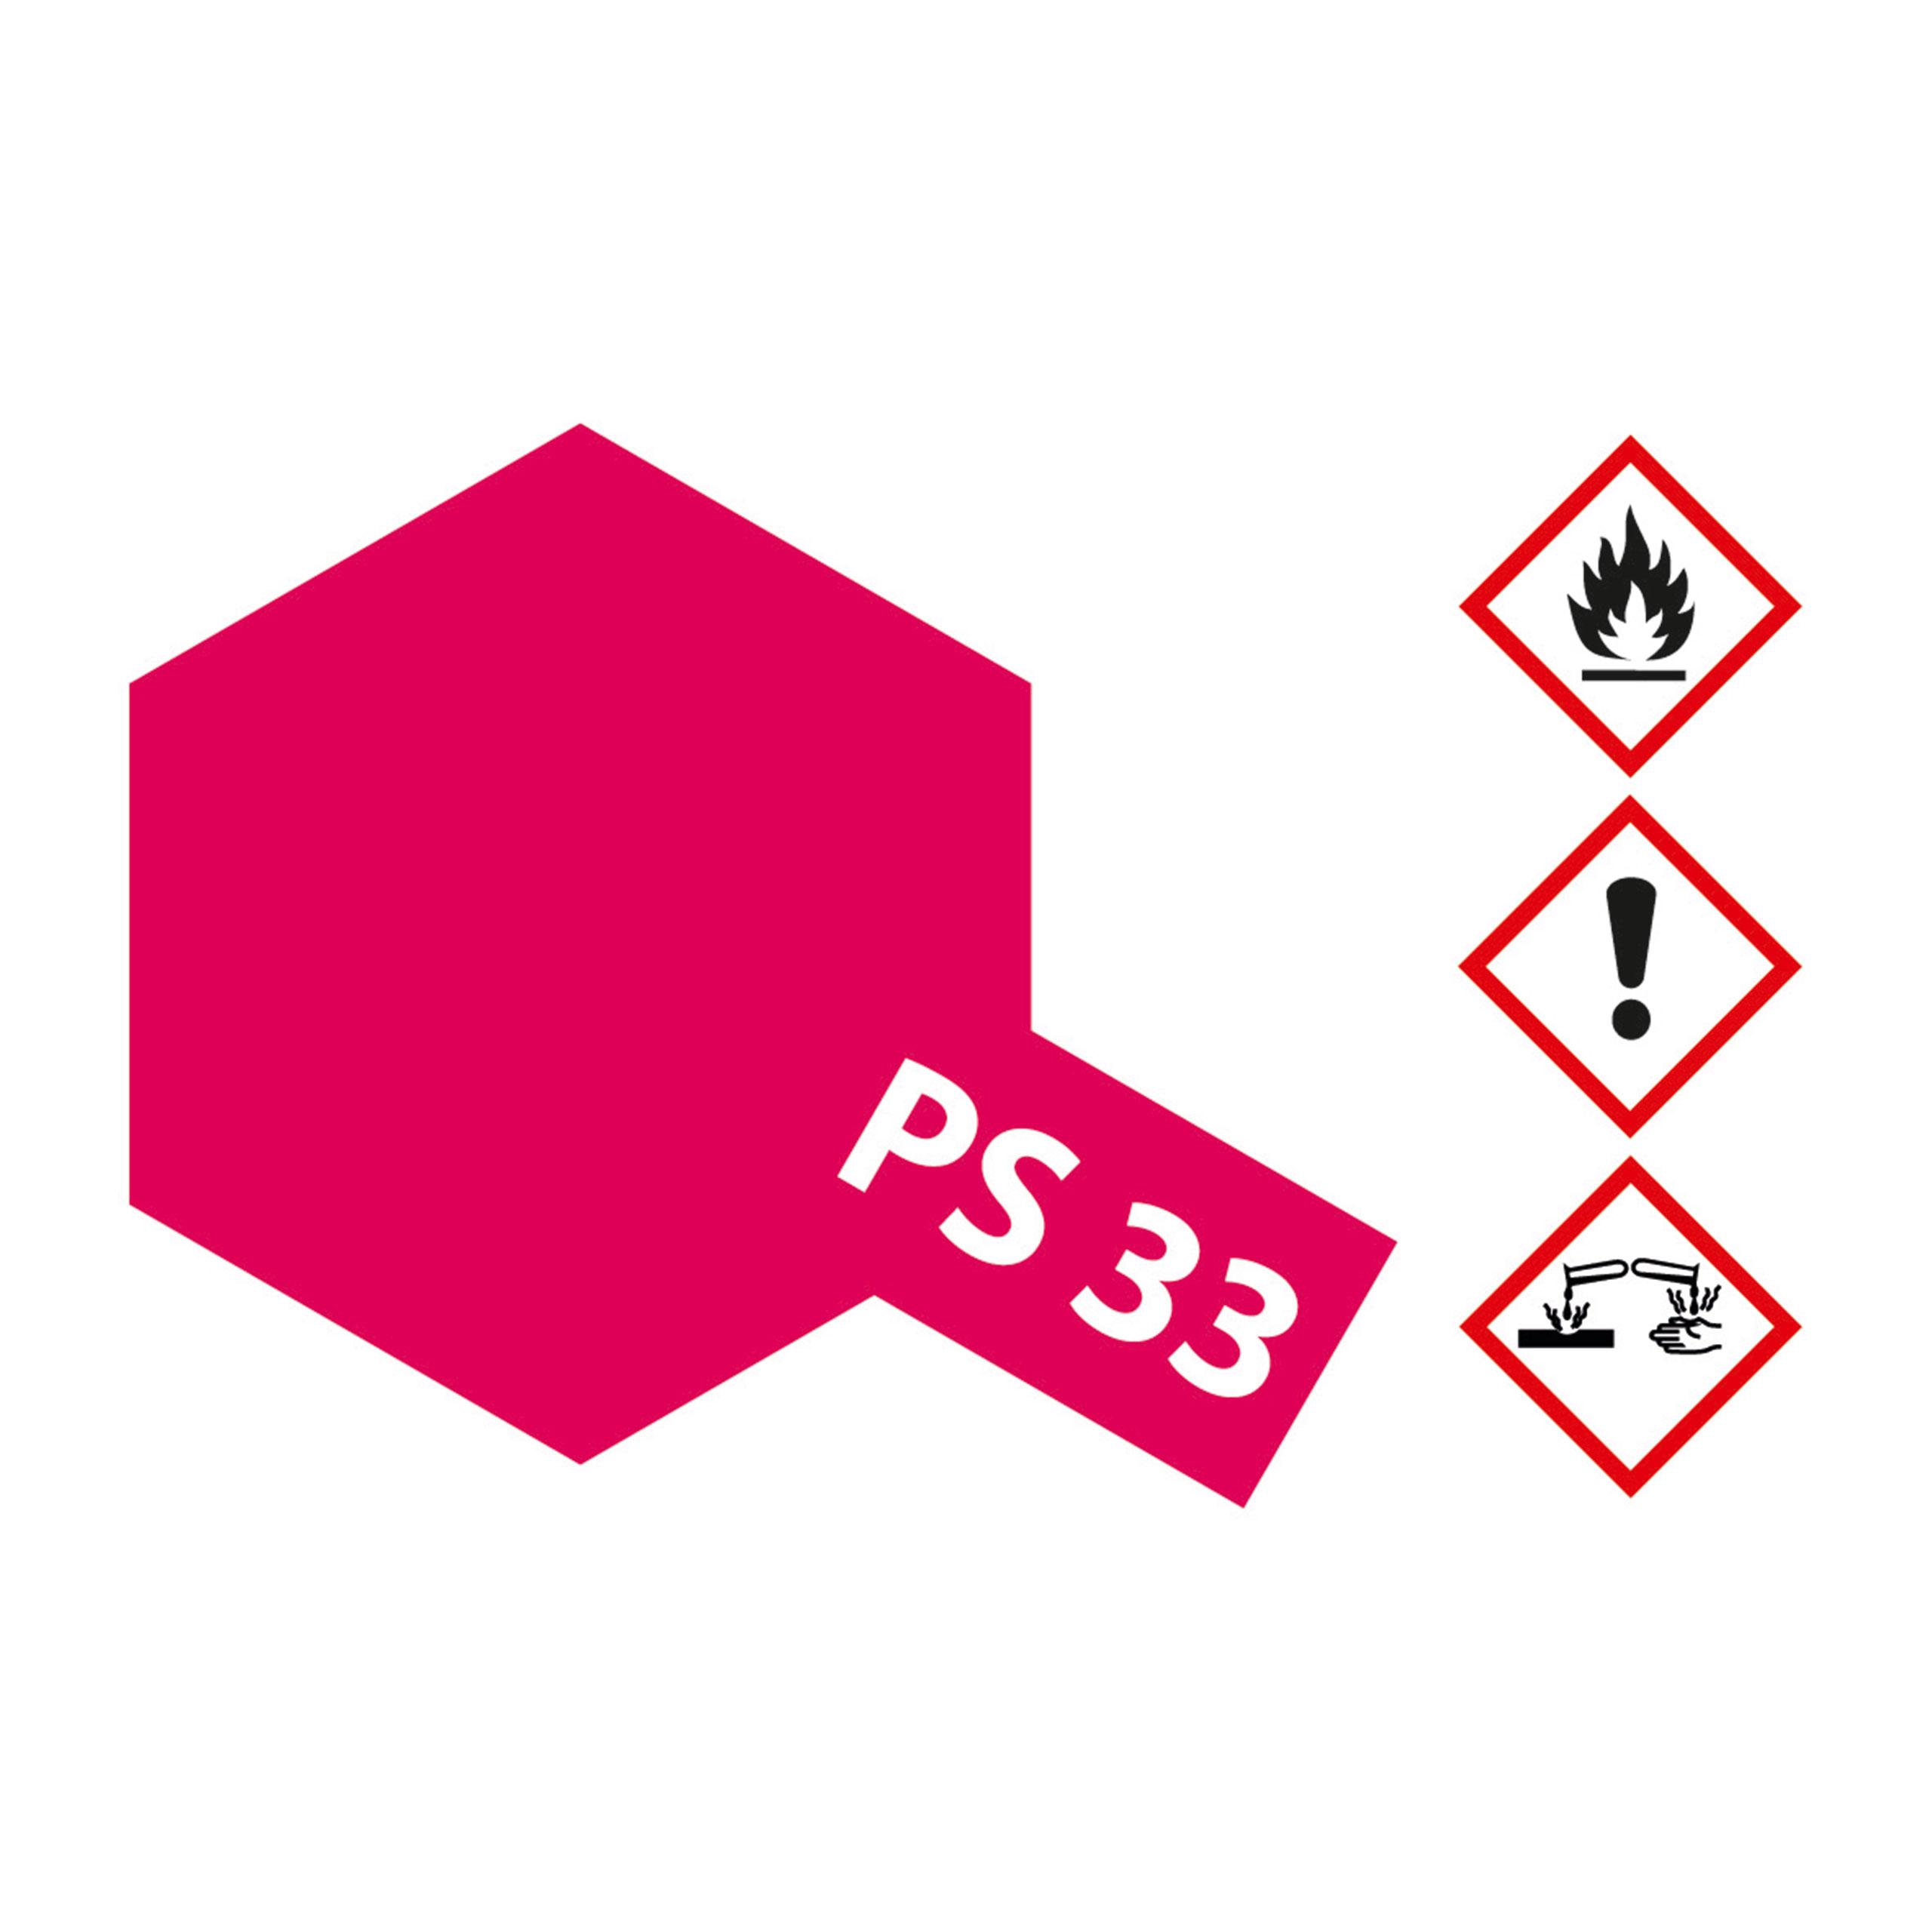 PS-33 Kirschrot Polycarbonat - 100ml Sprayfarbe Lexan - Tamiya 300086033